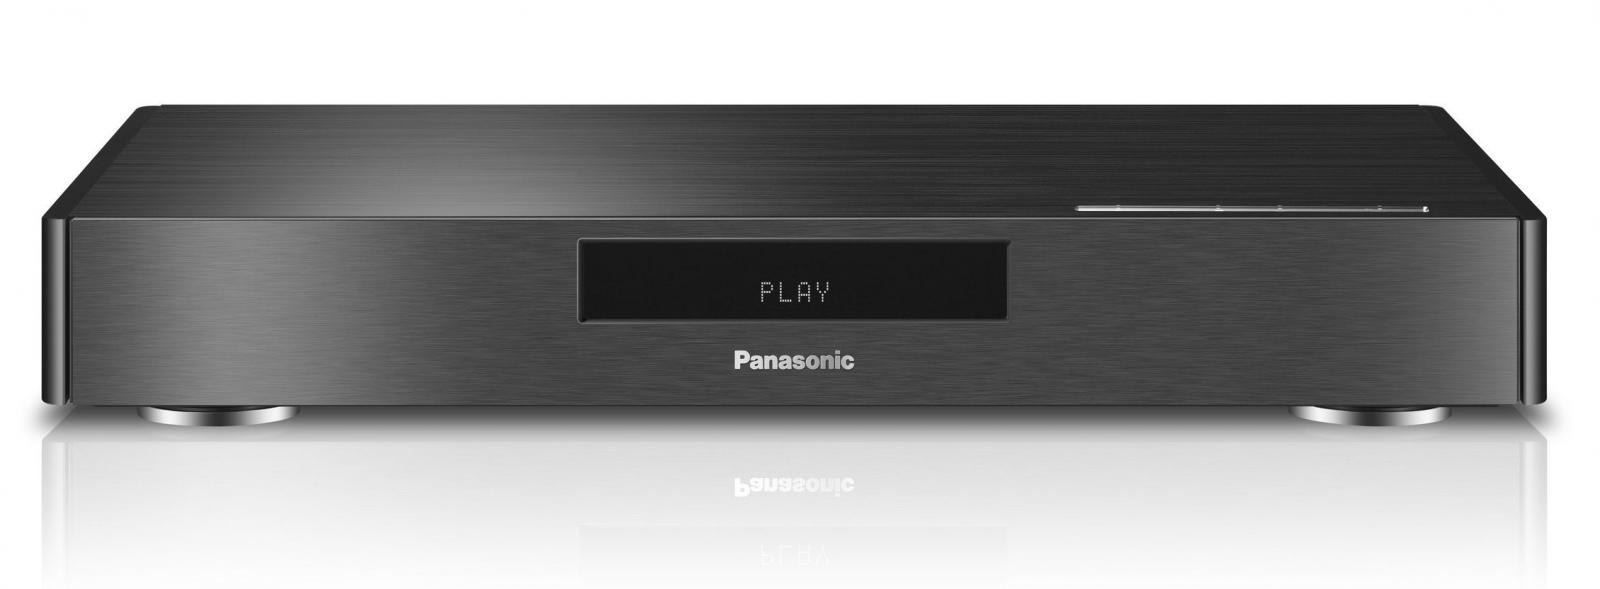 Panasonic 4K Blu-ray player unveiled